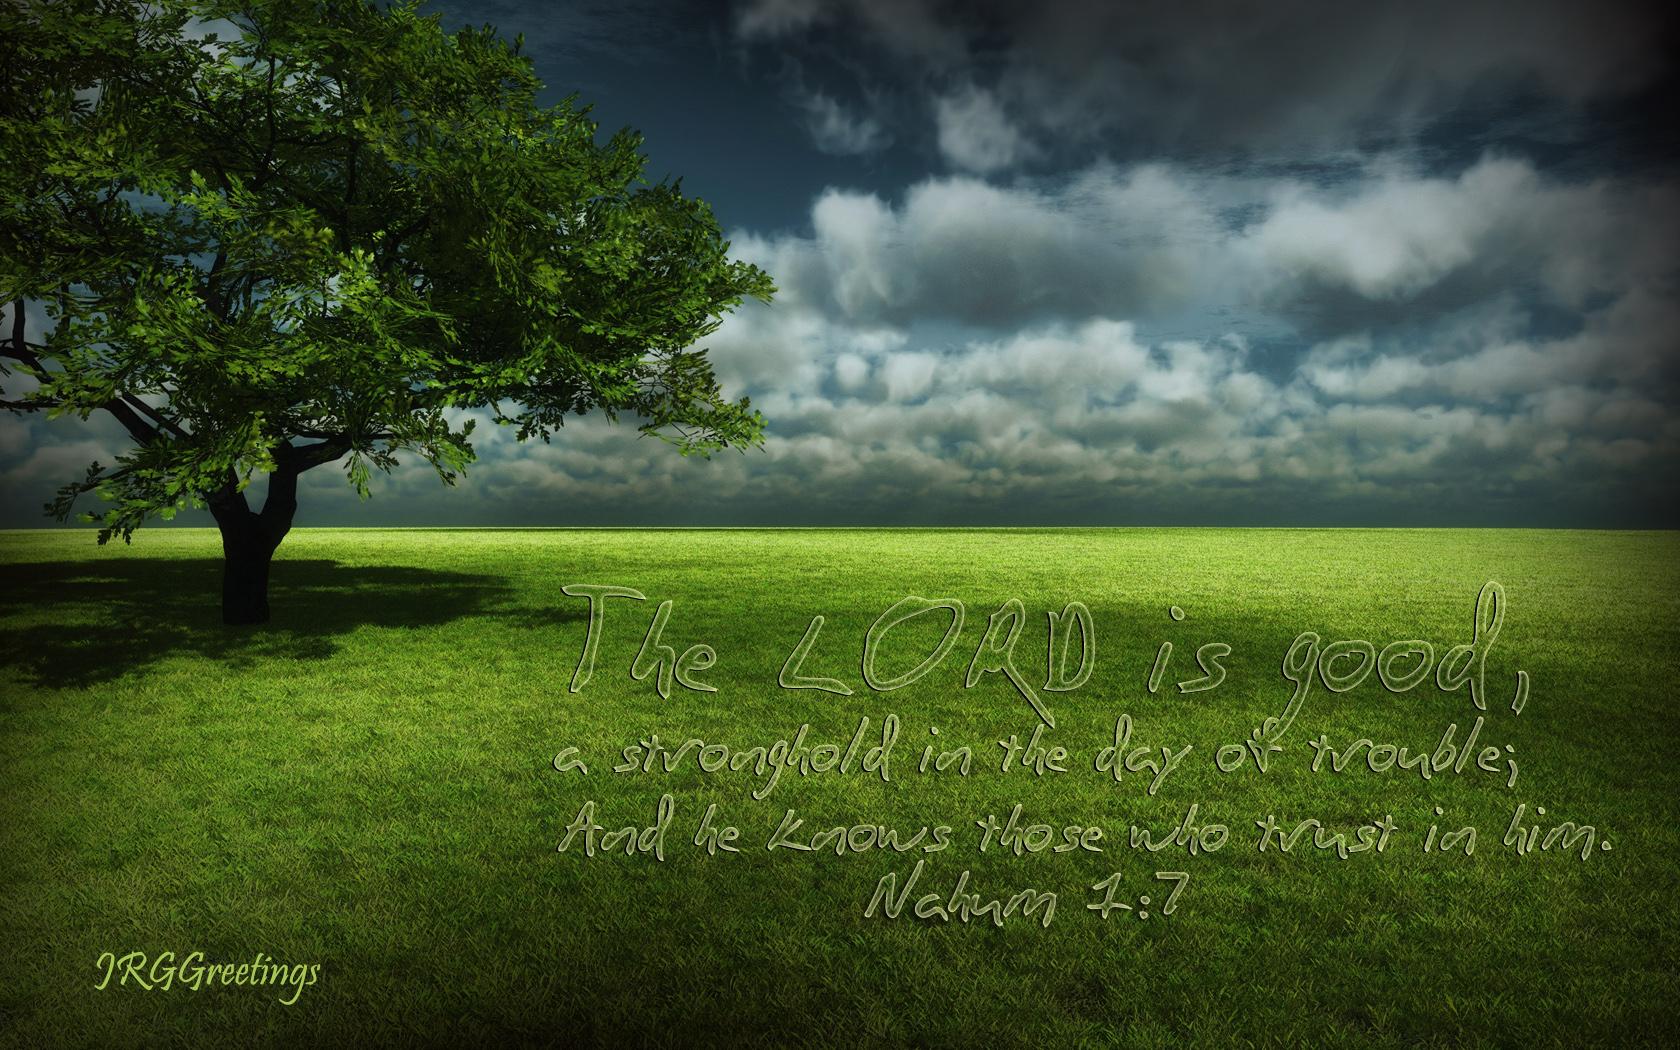 50+ Free Religious Desktop Wallpaper Screensavers on ...